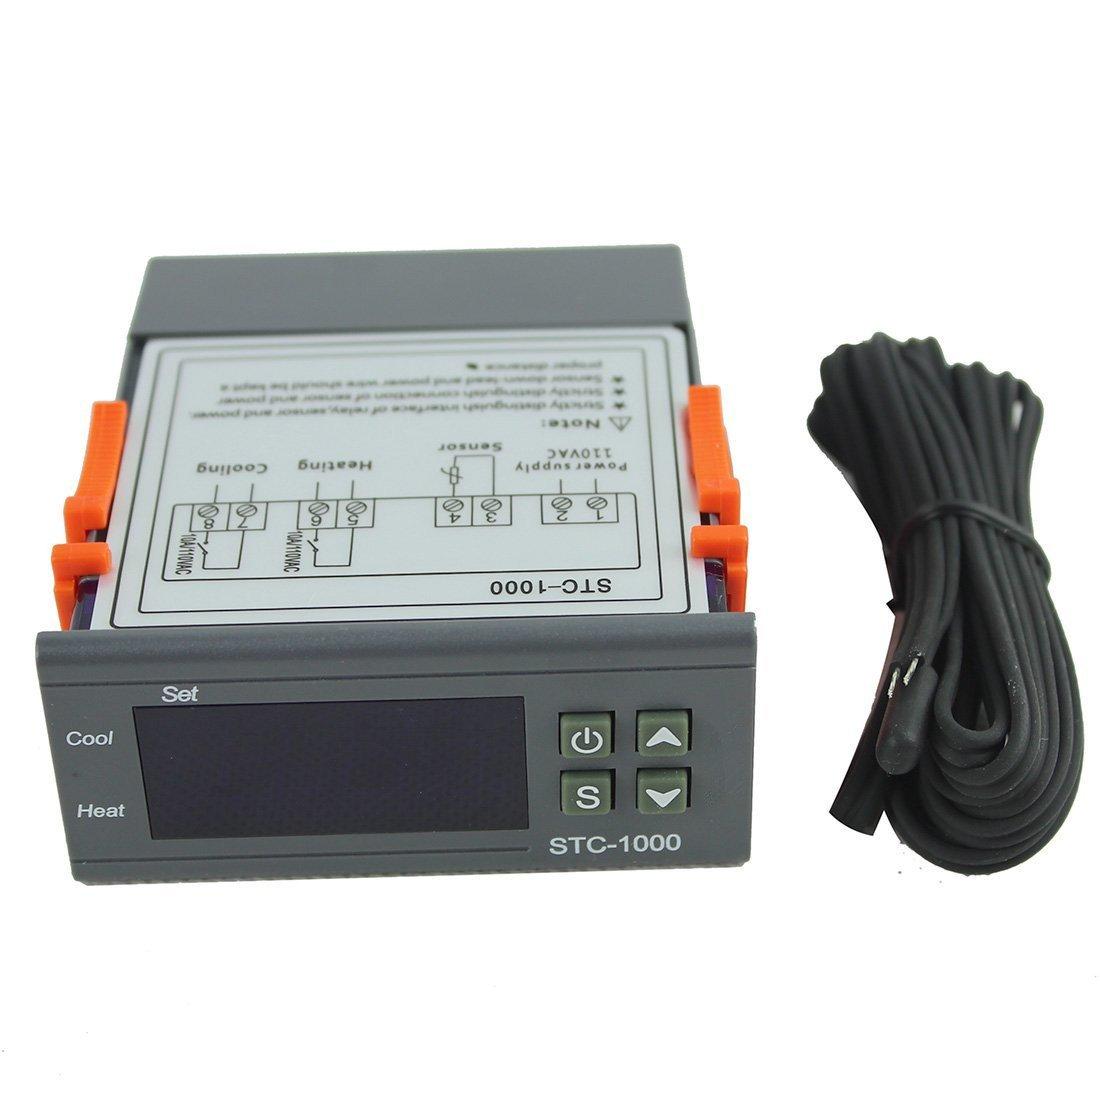 110V All-Purpose Temperature Controller STC-1000 With Sensor